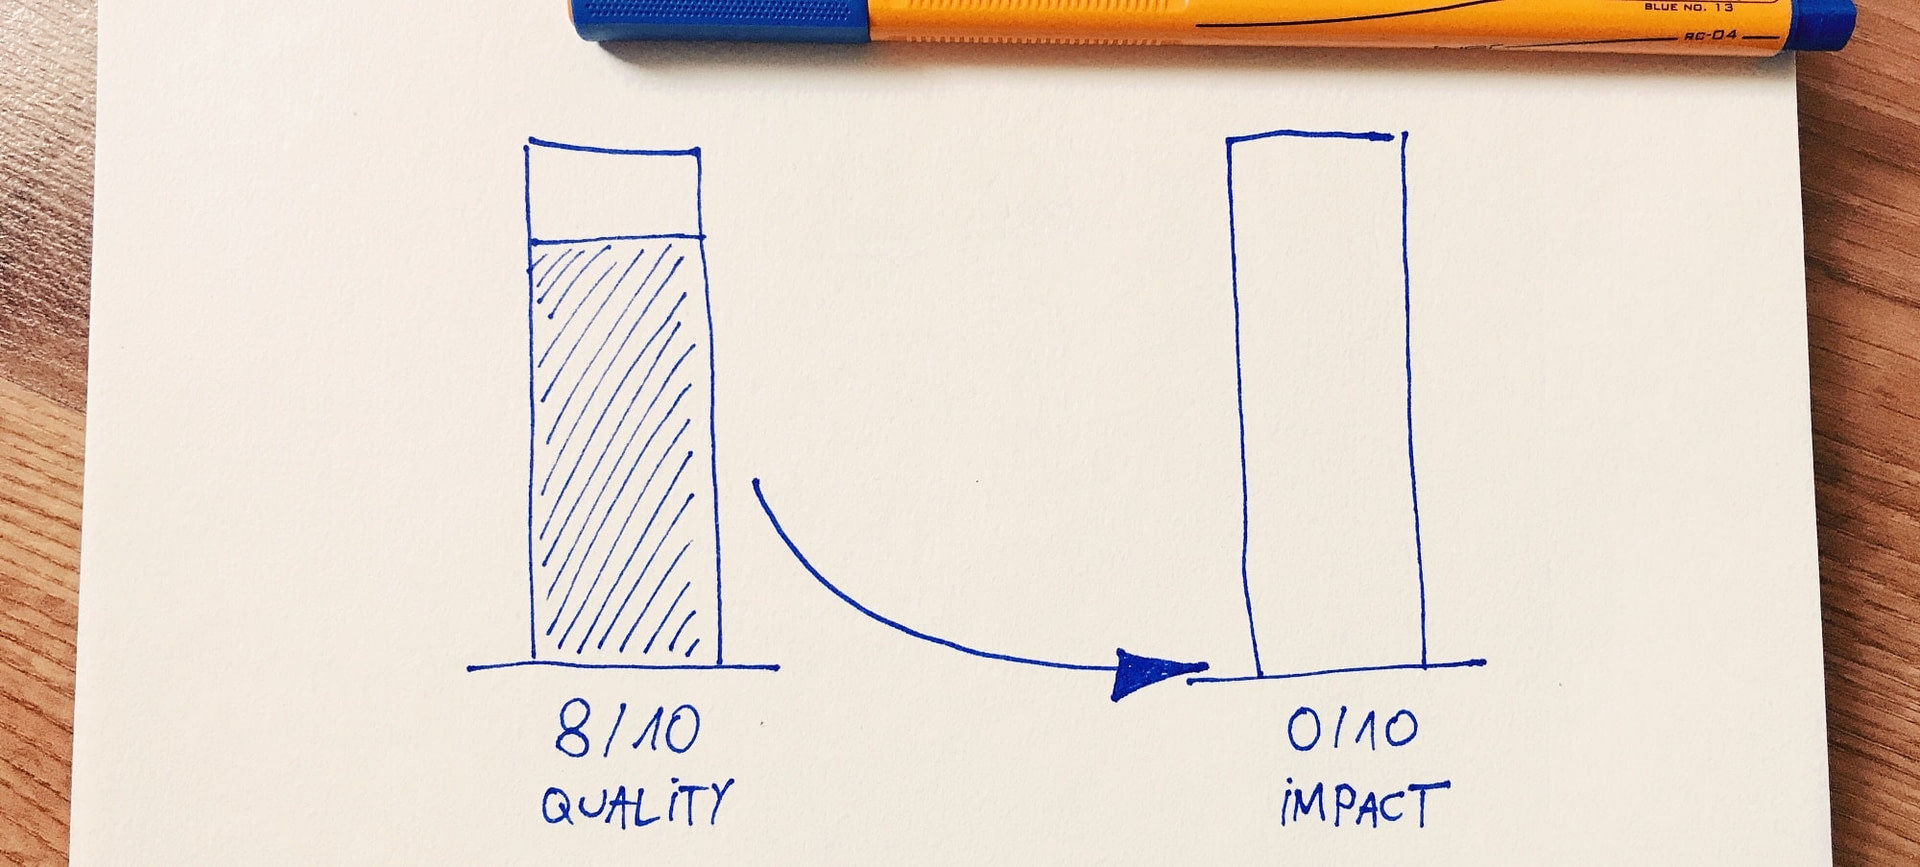 quality vs impact